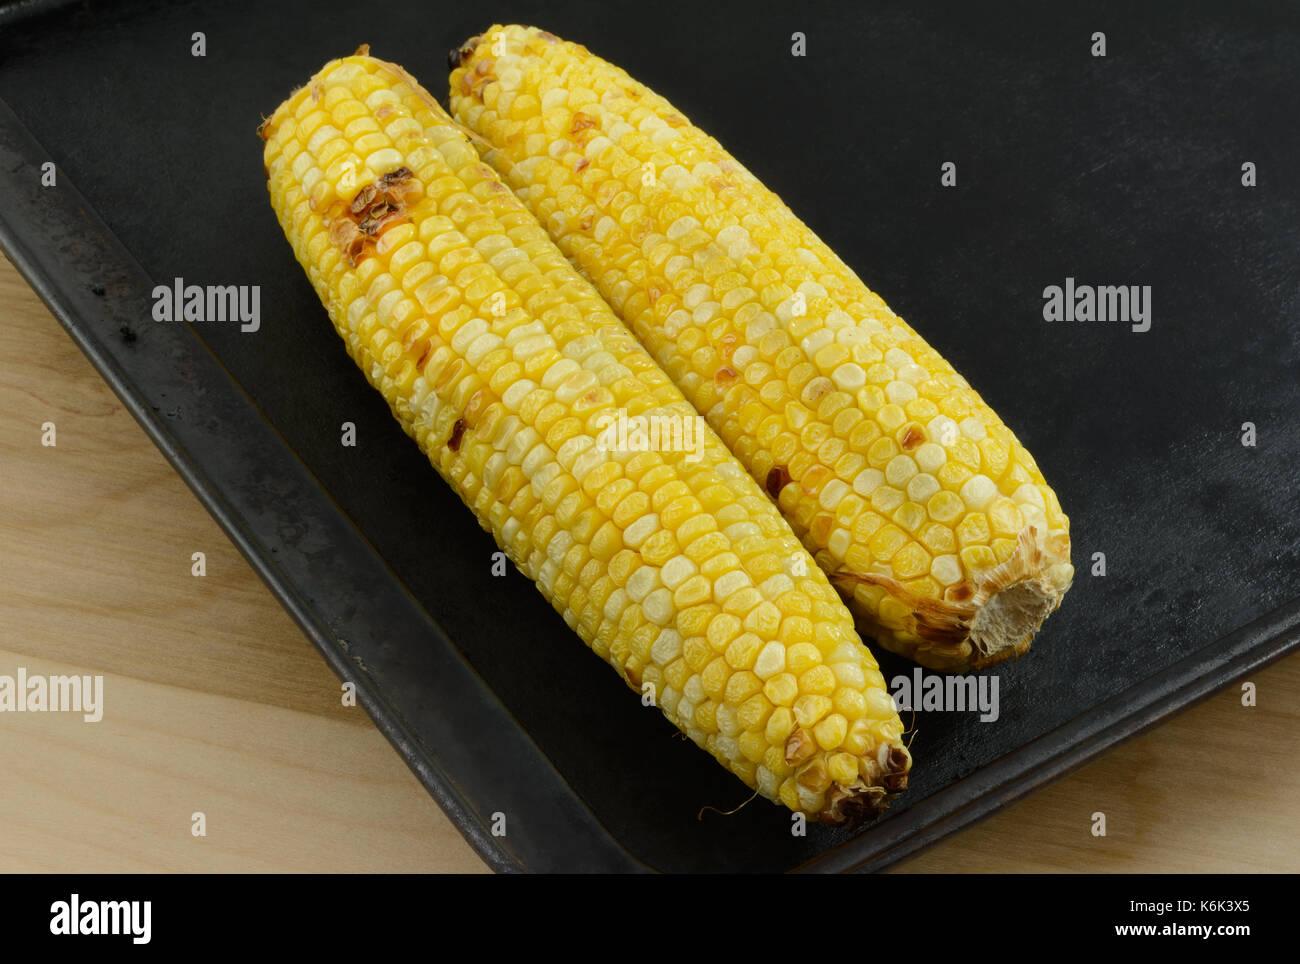 Two ears of blackened roasted corn on baking sheet - Stock Image